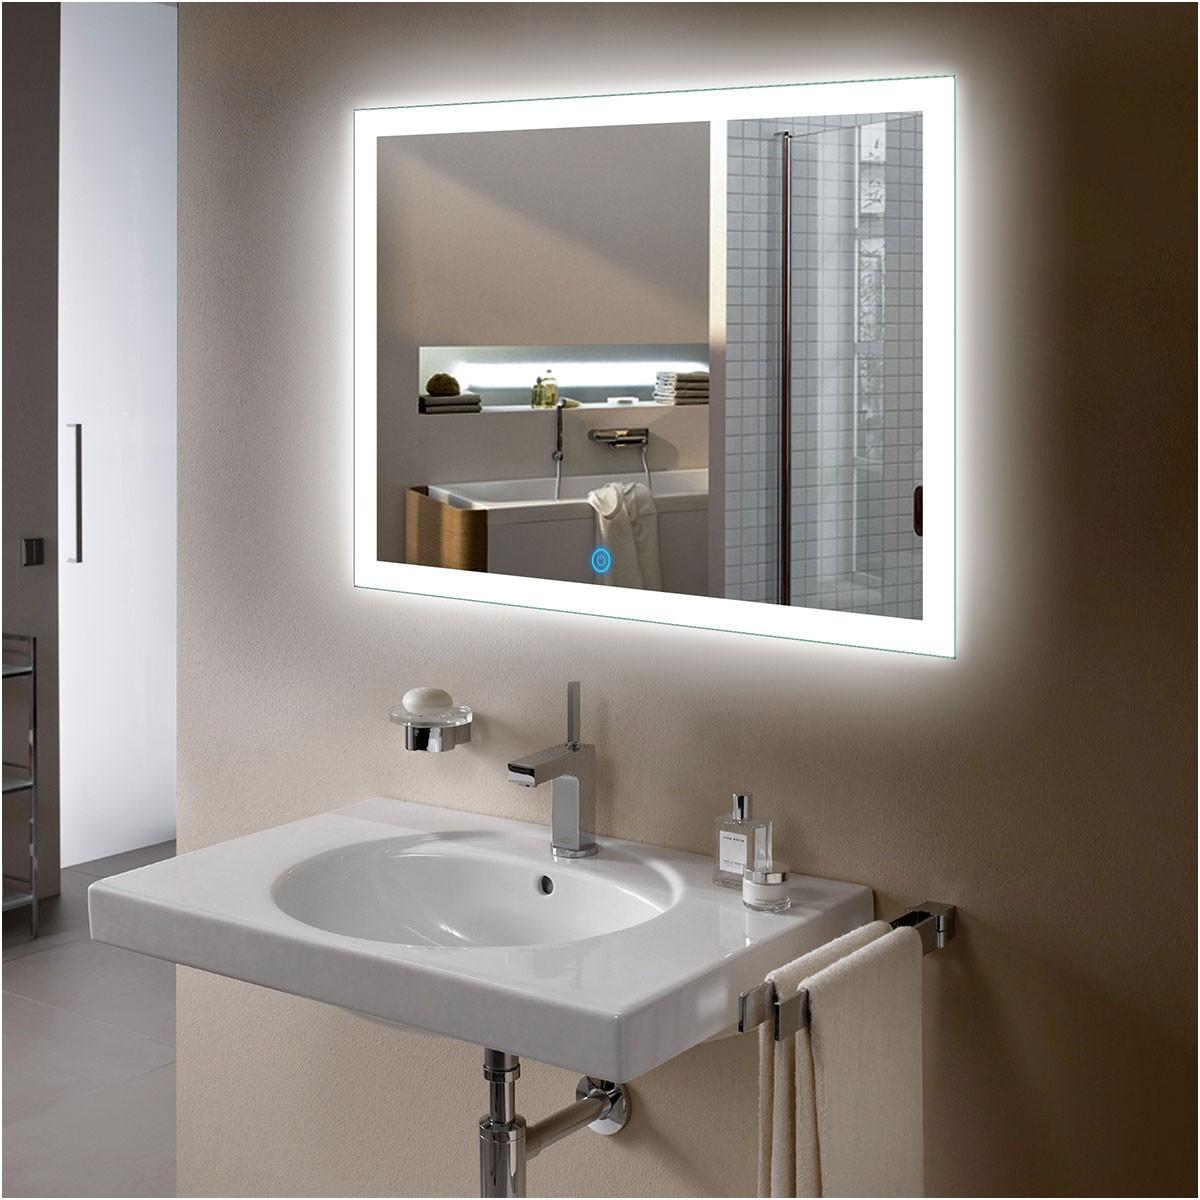 Beautiful Circular Bathroom Mirrors with Lights